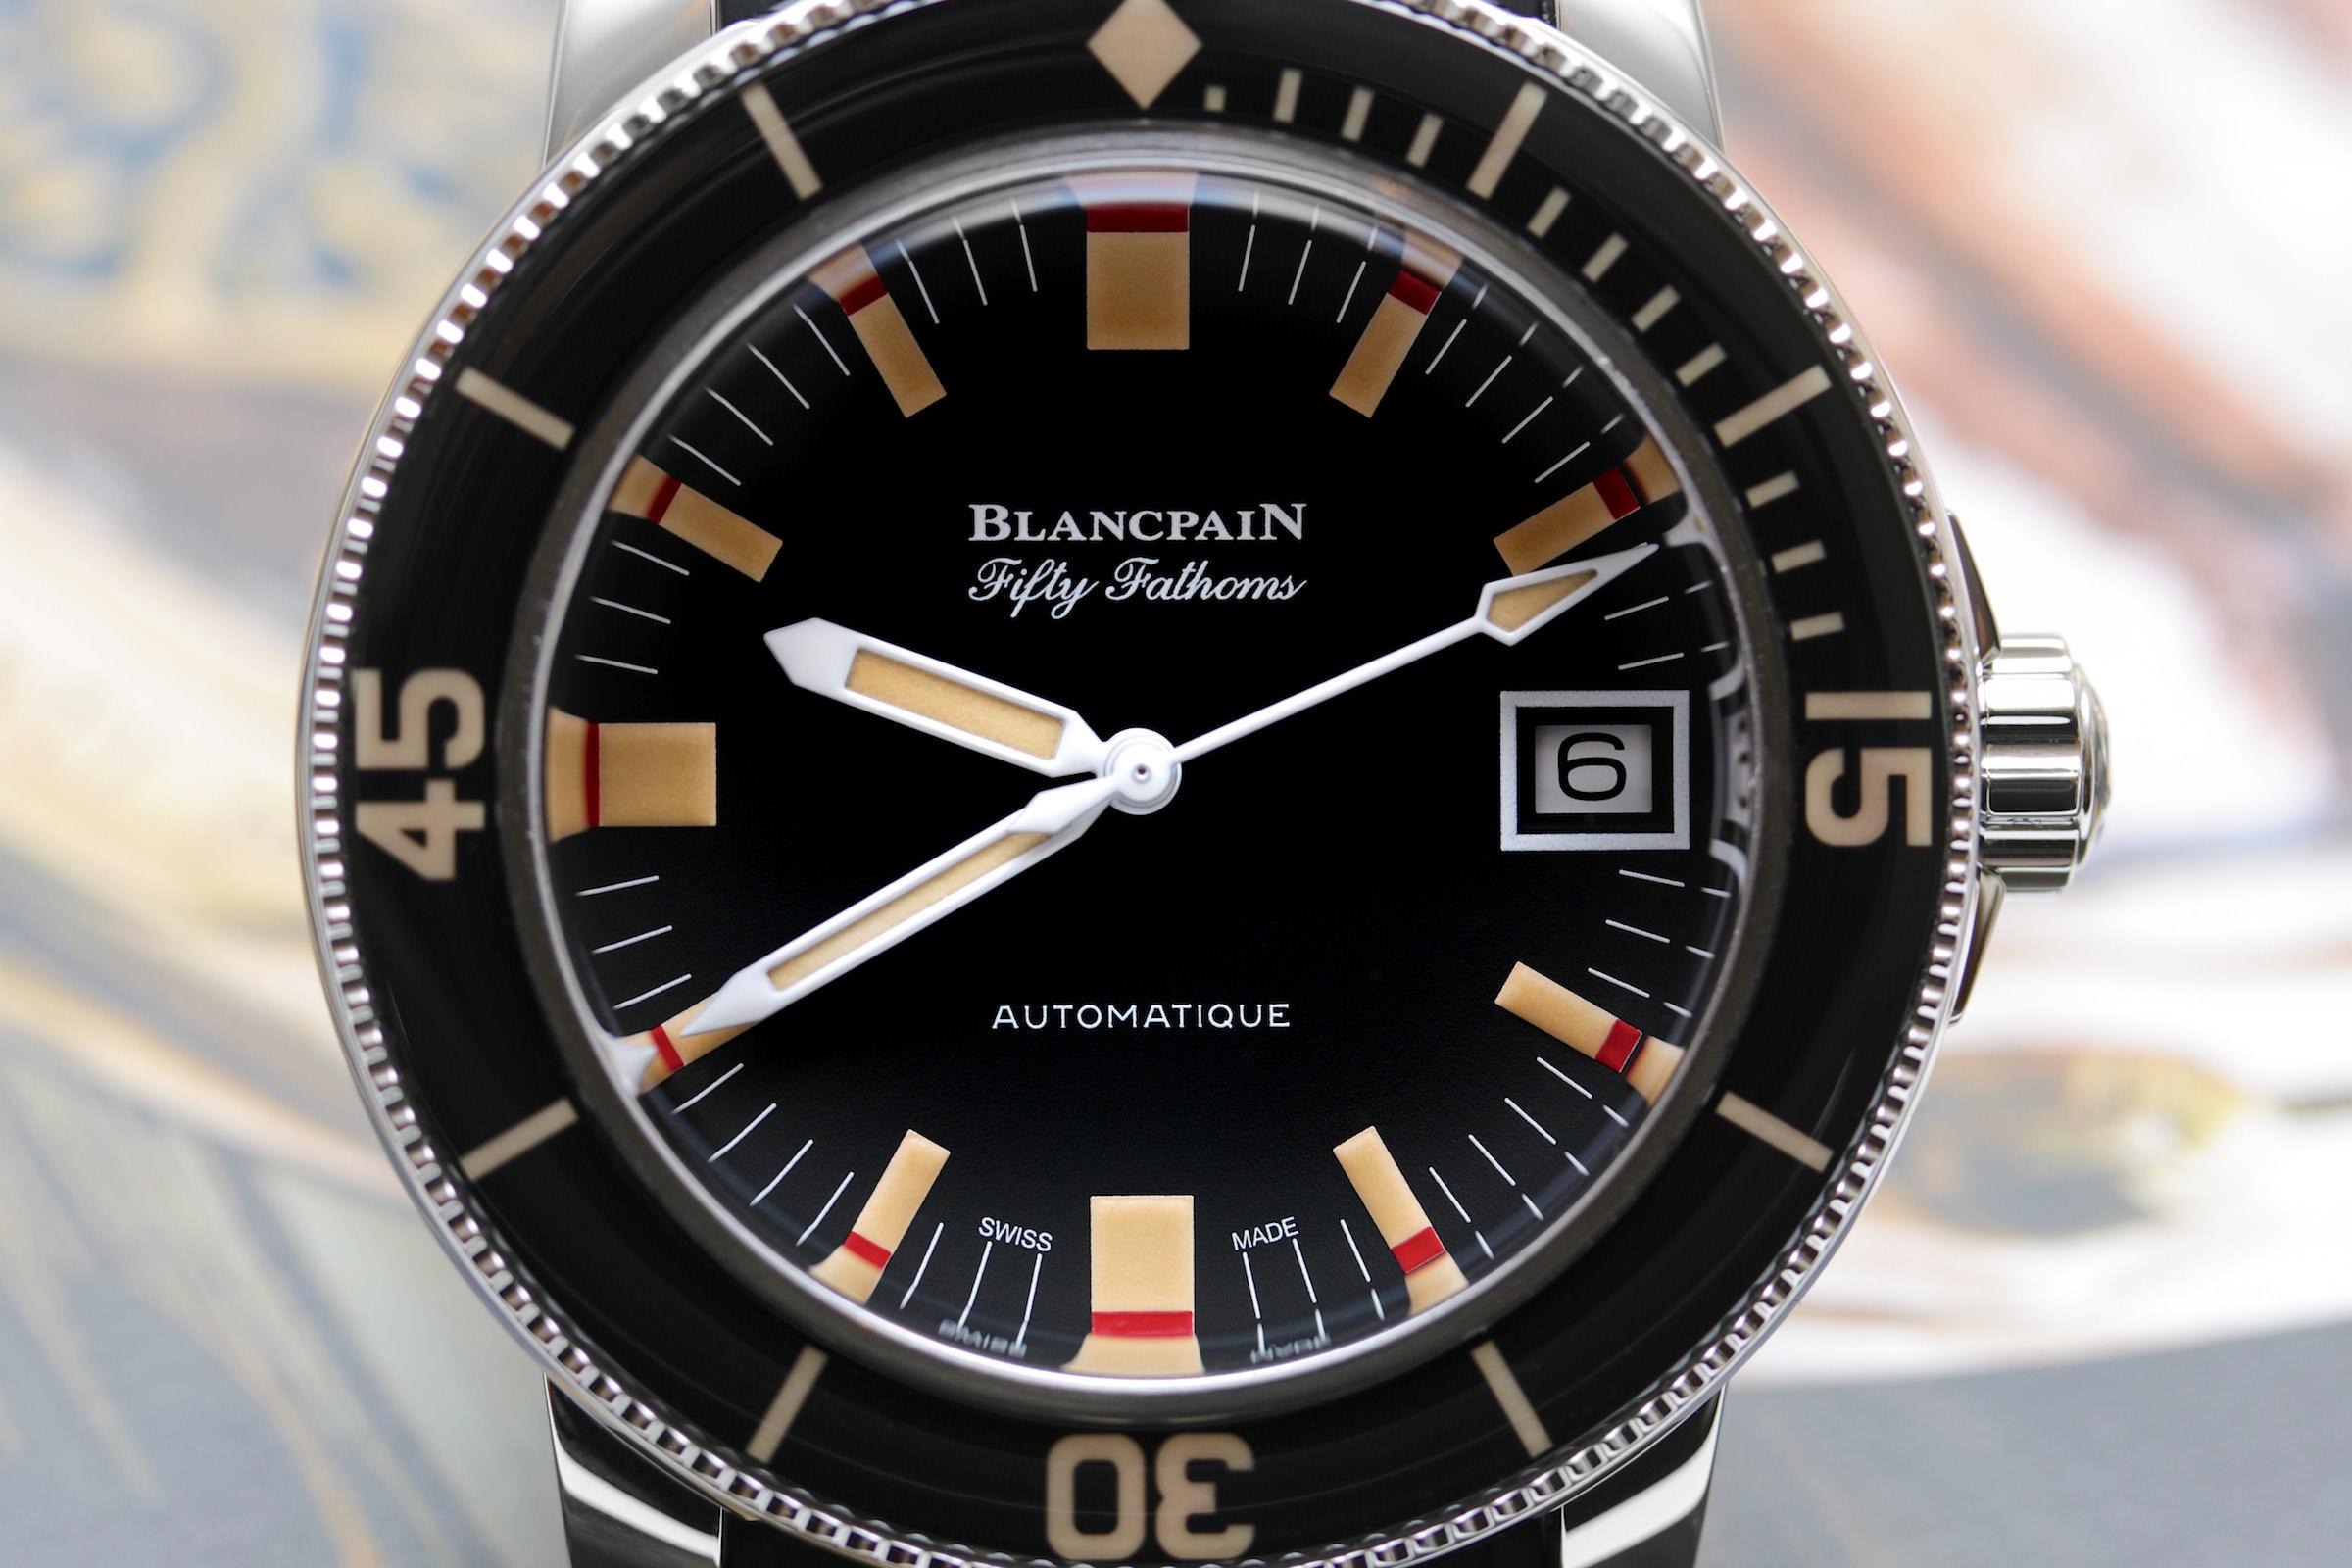 Die Blancpain Barakuda Limited Edition